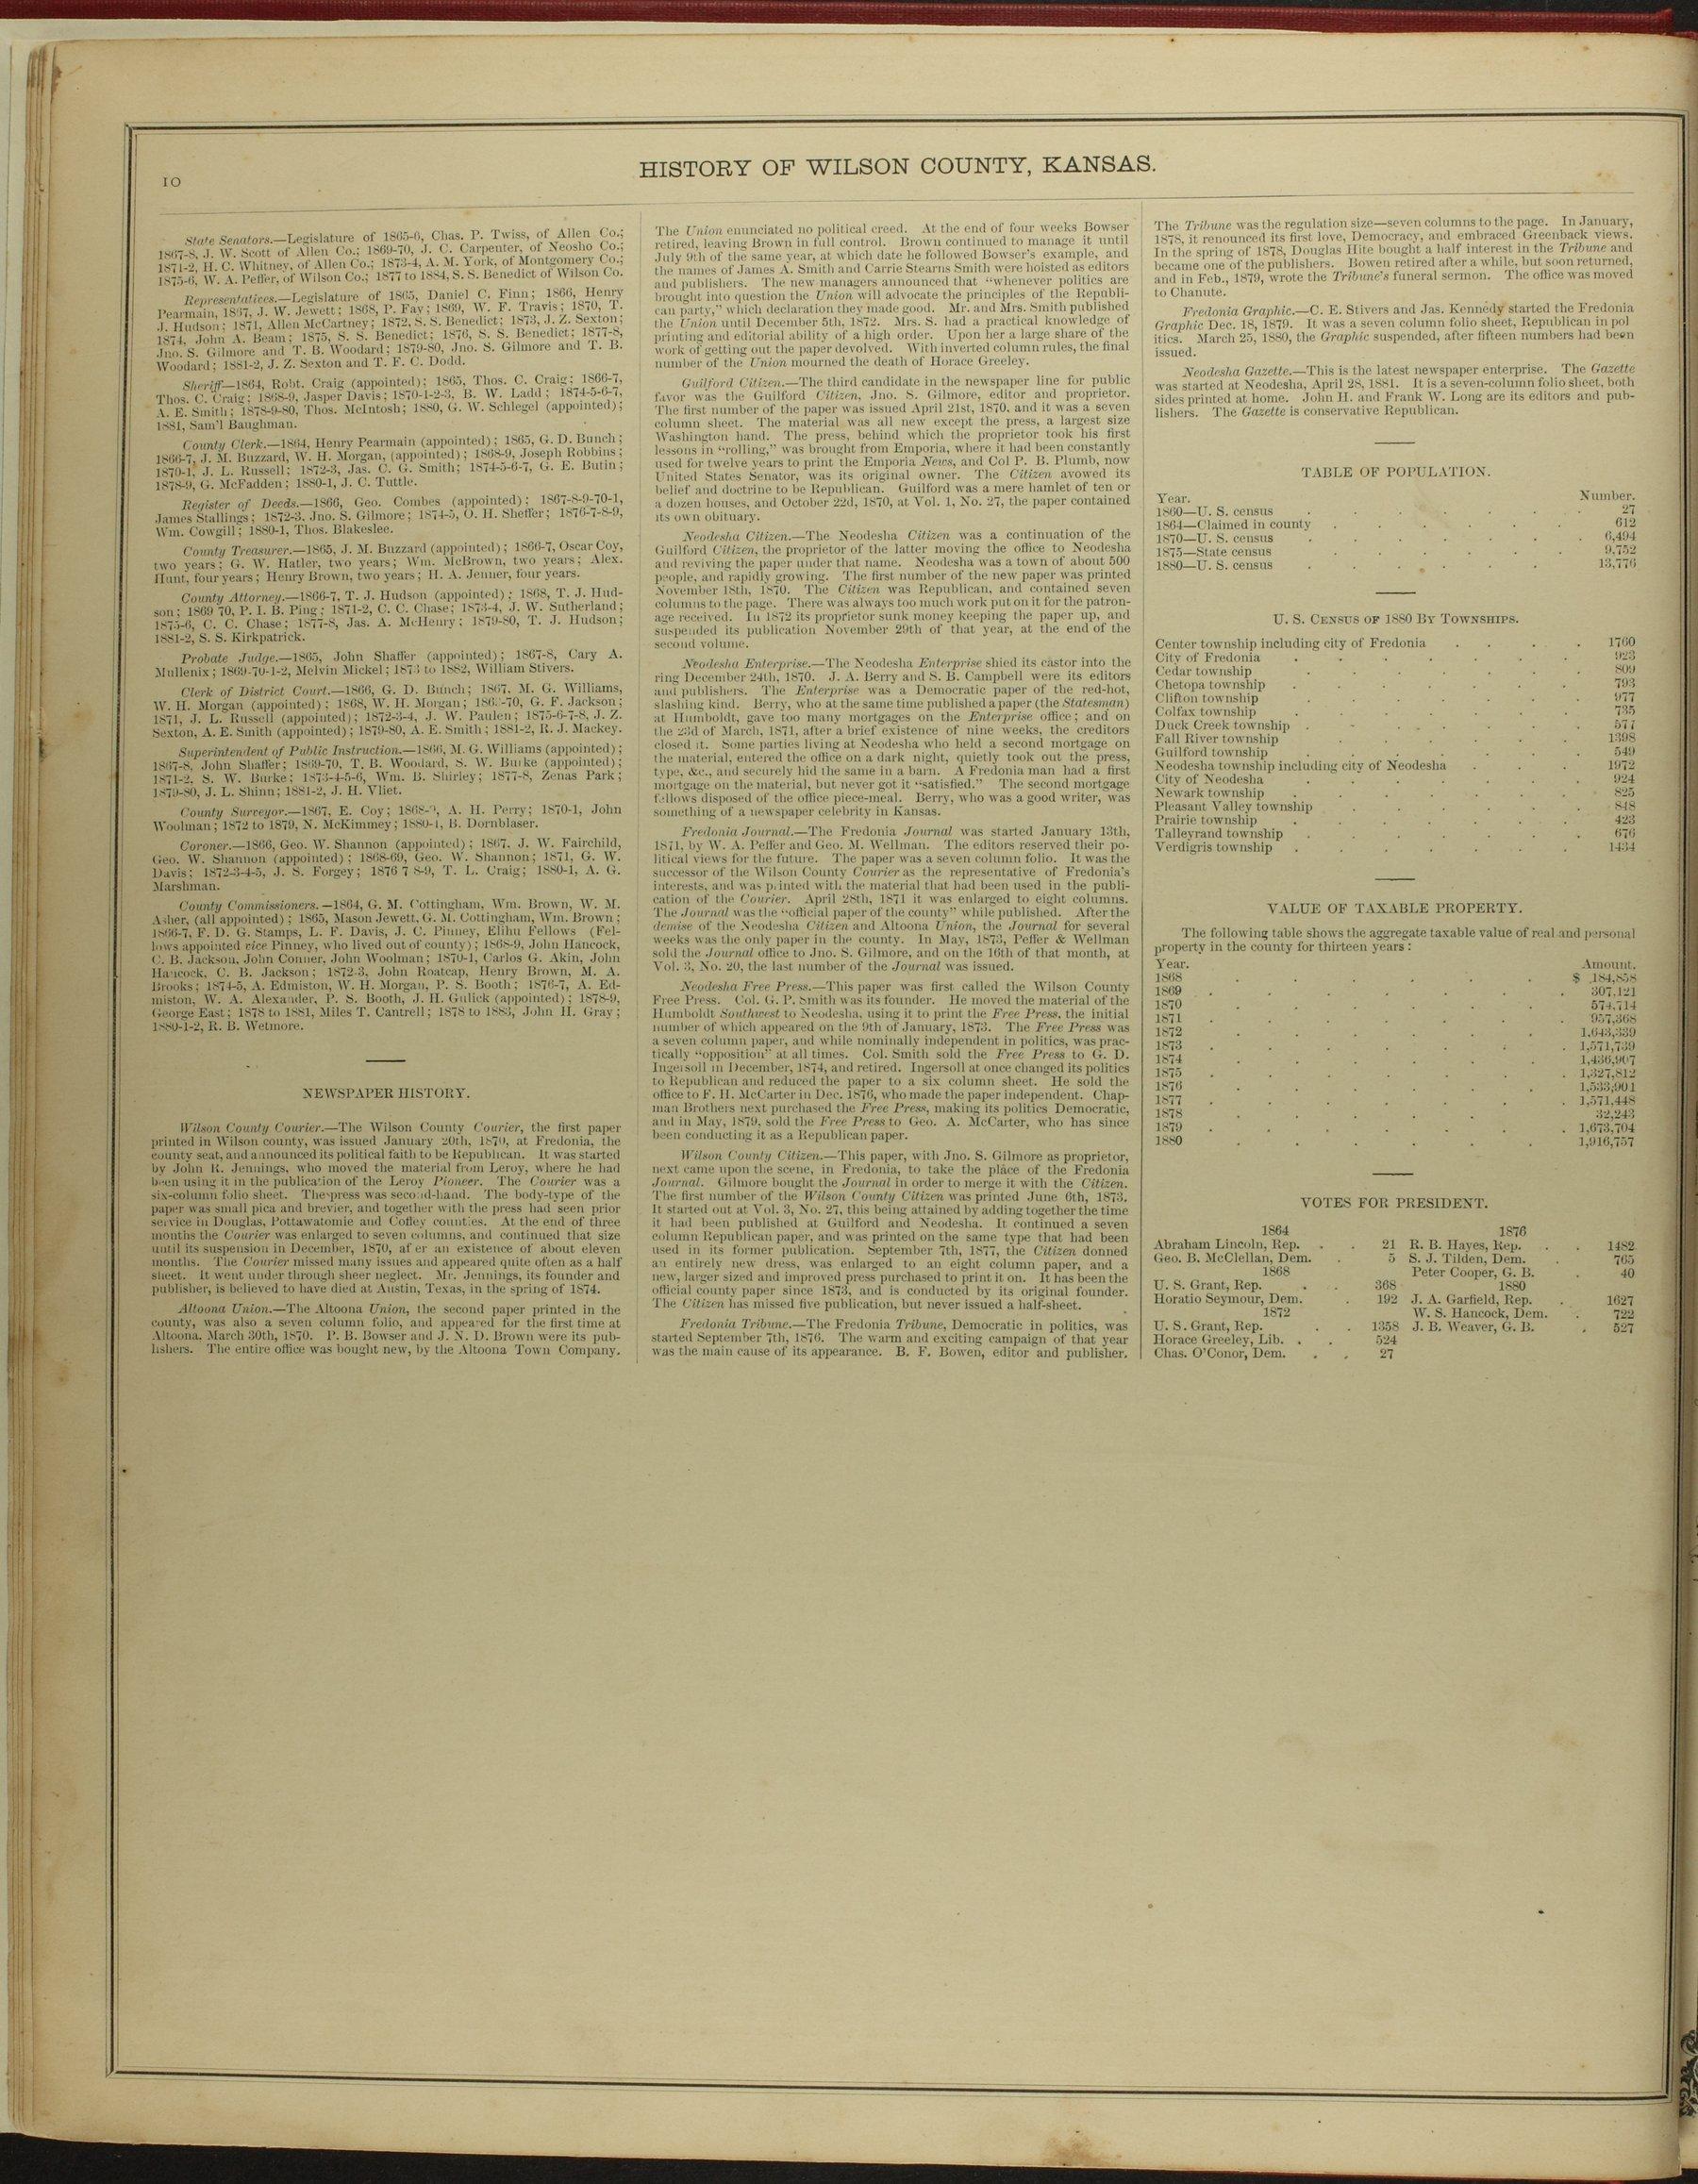 Historical atlas of Wilson County, Kansas - 10